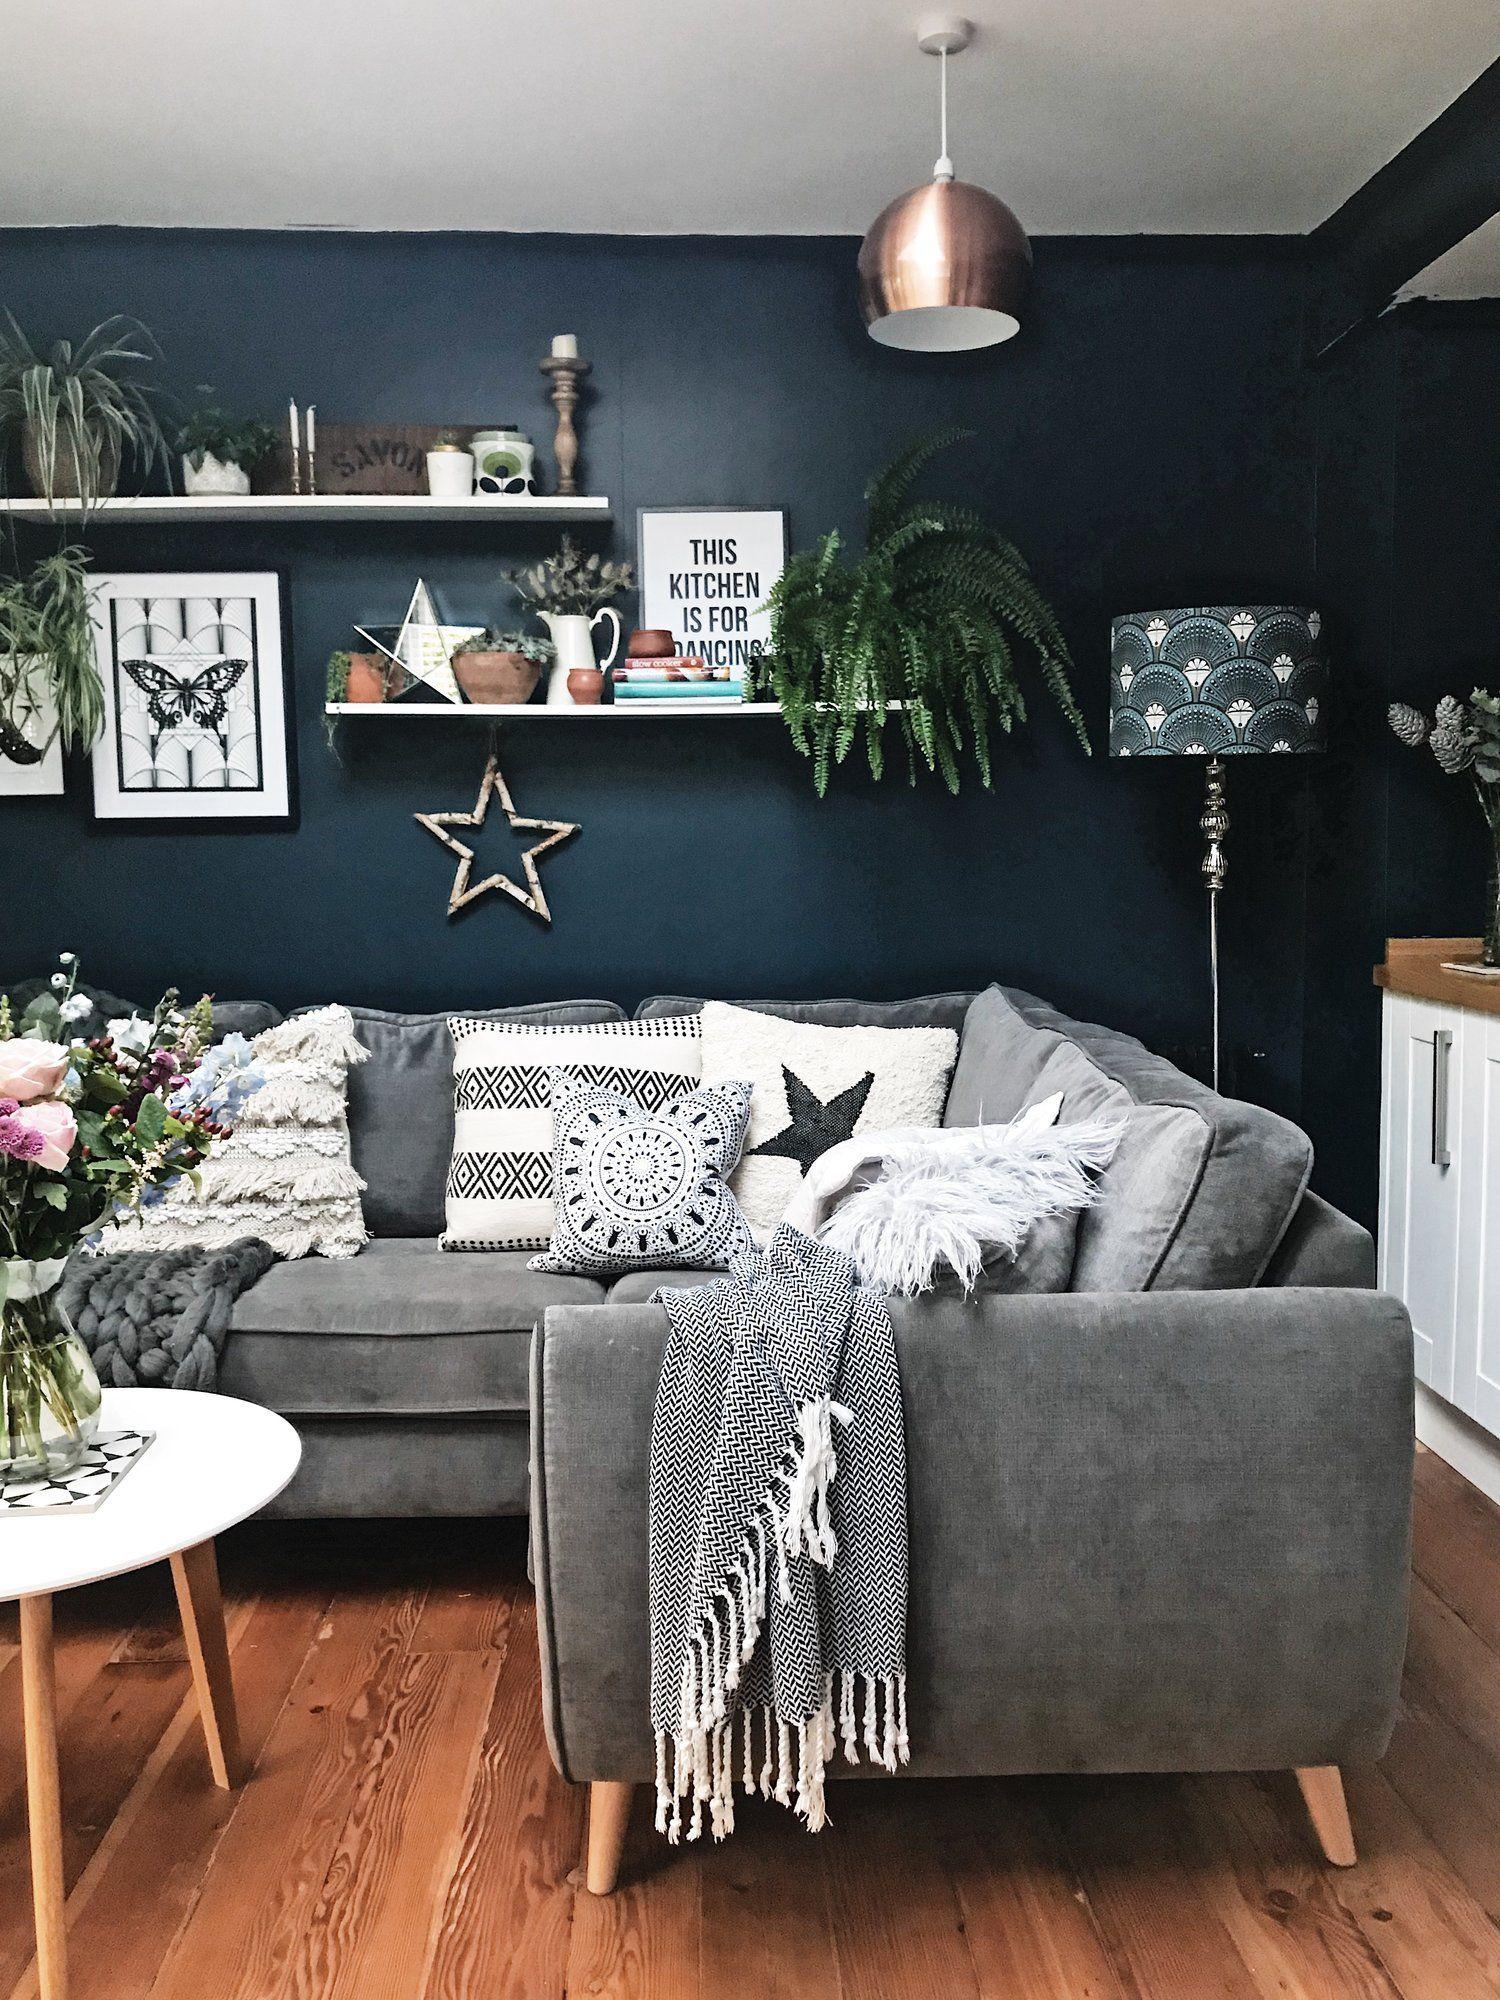 Pin On Top Home Decor 2019 Jade living room ideas